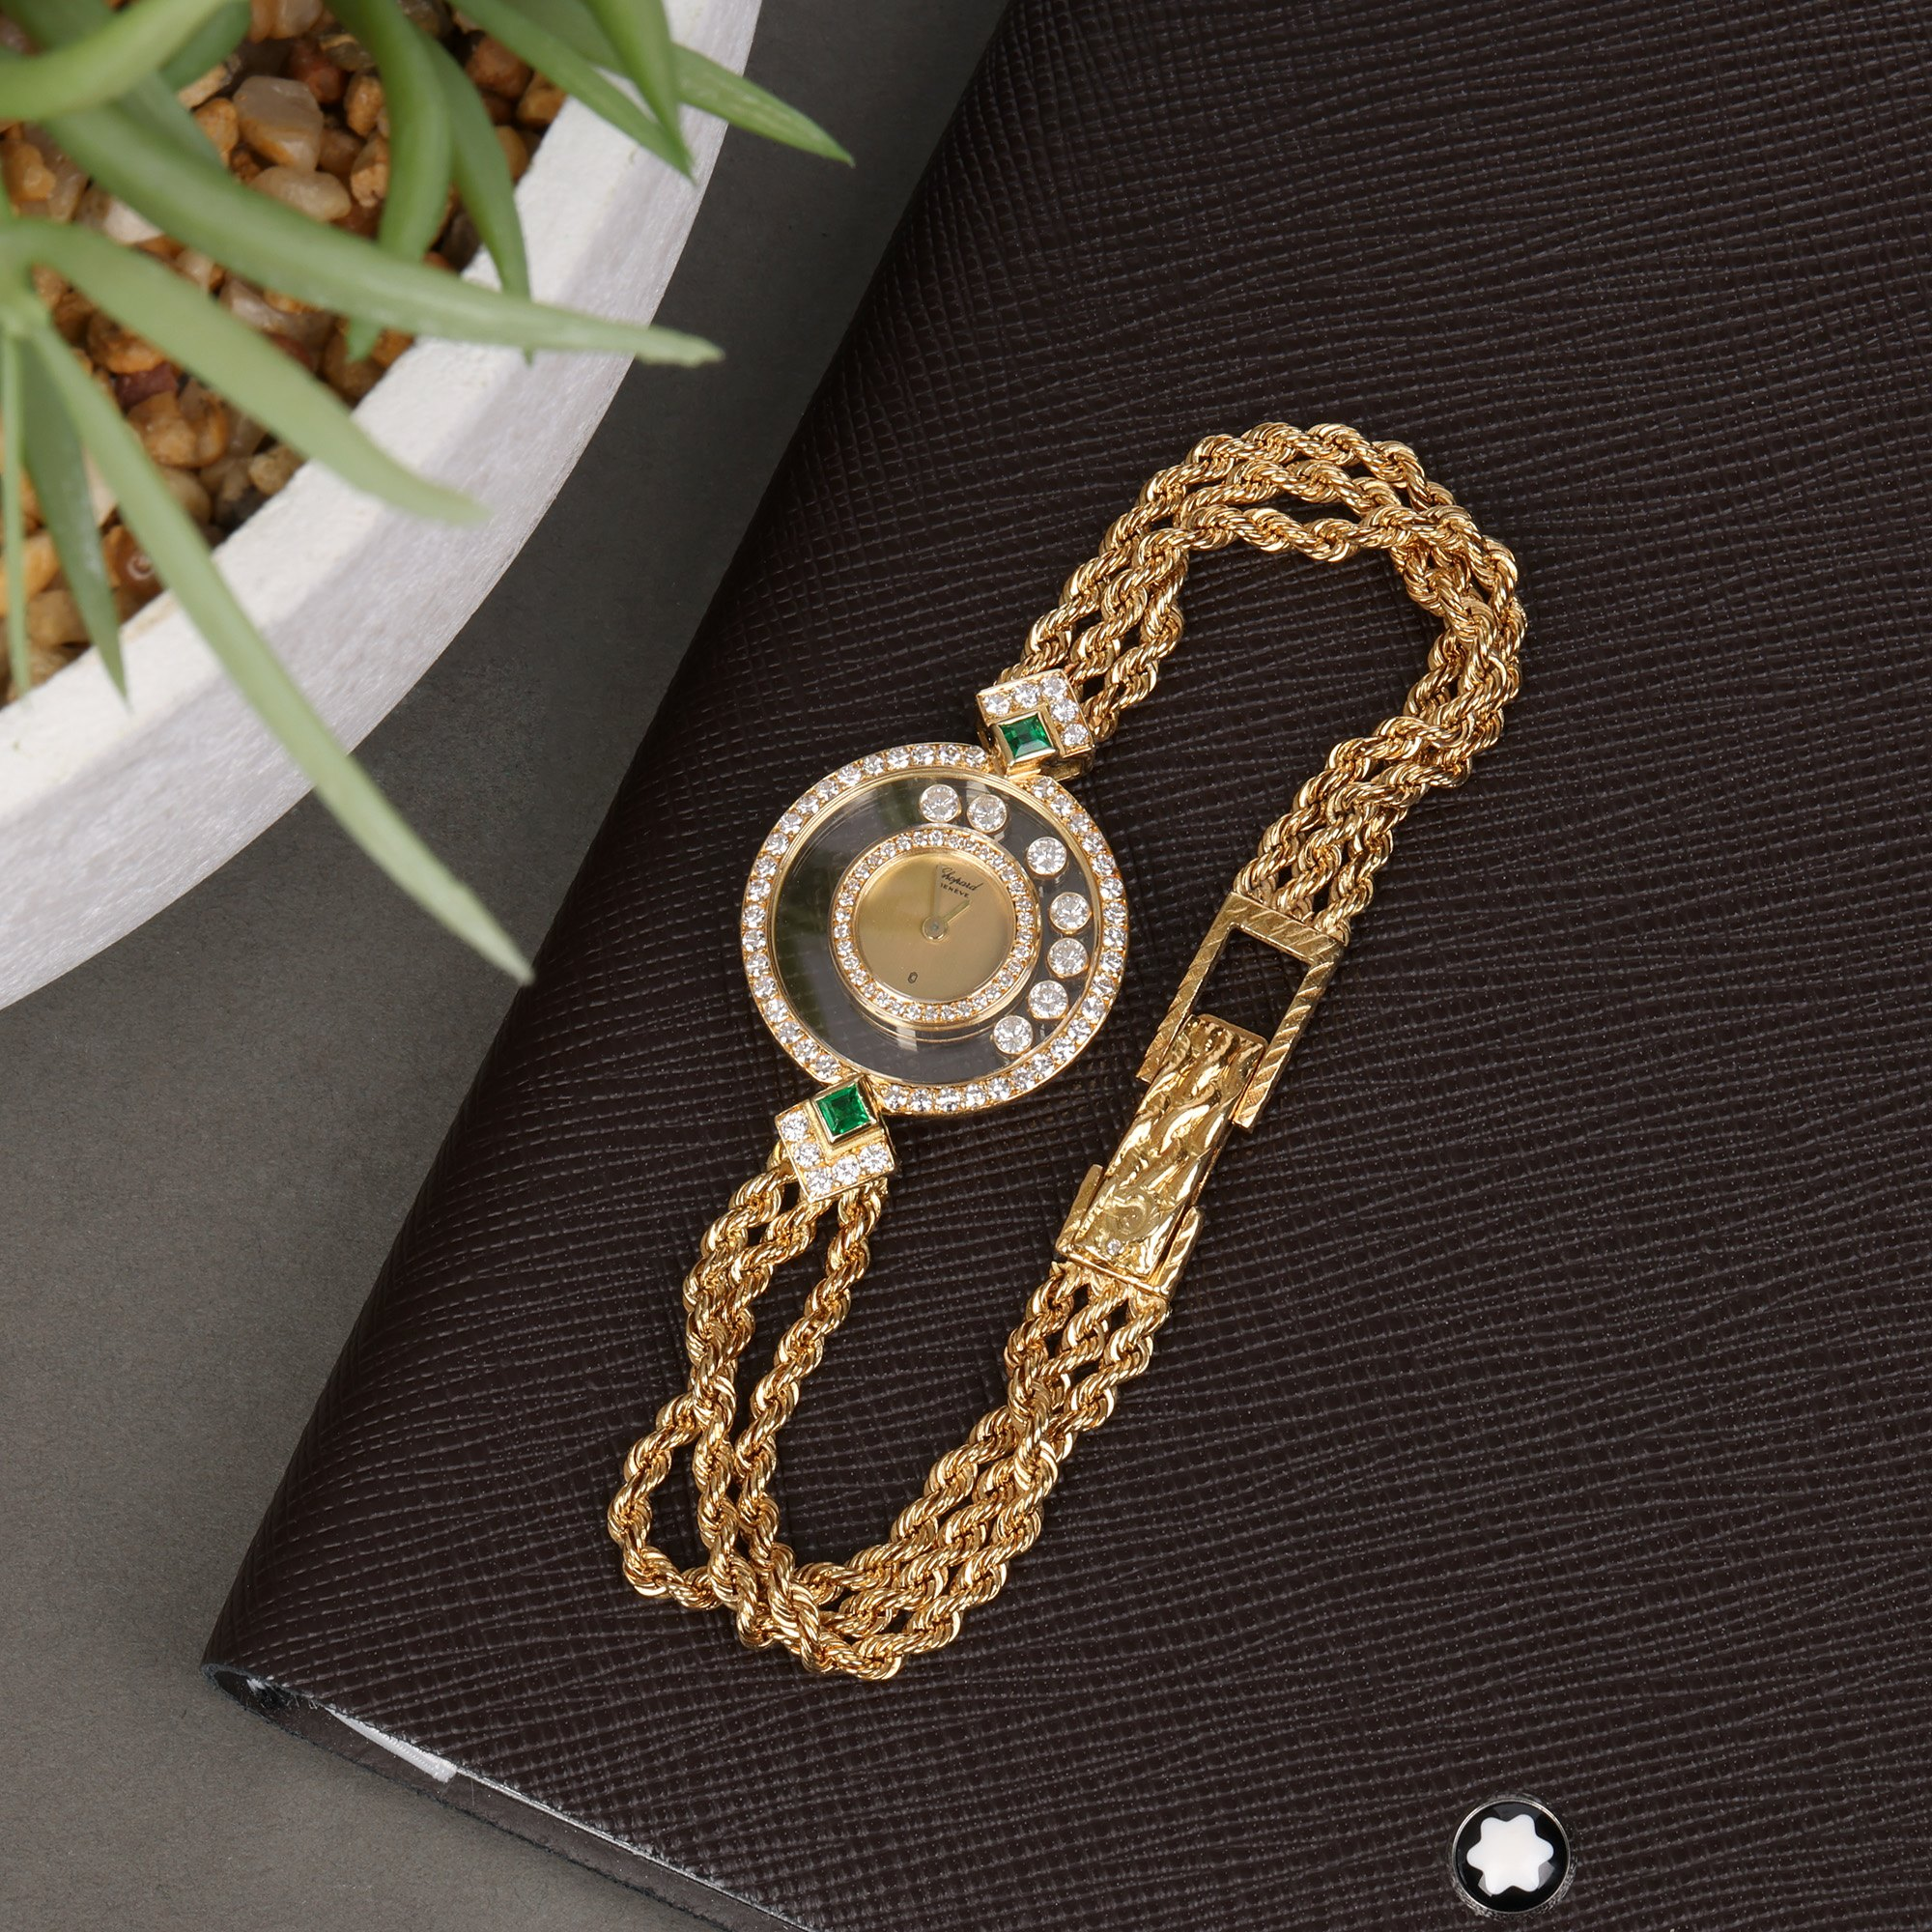 Chopard Happy Diamonds Diamond & Emerald Bezel 18K Geel Goud 4066